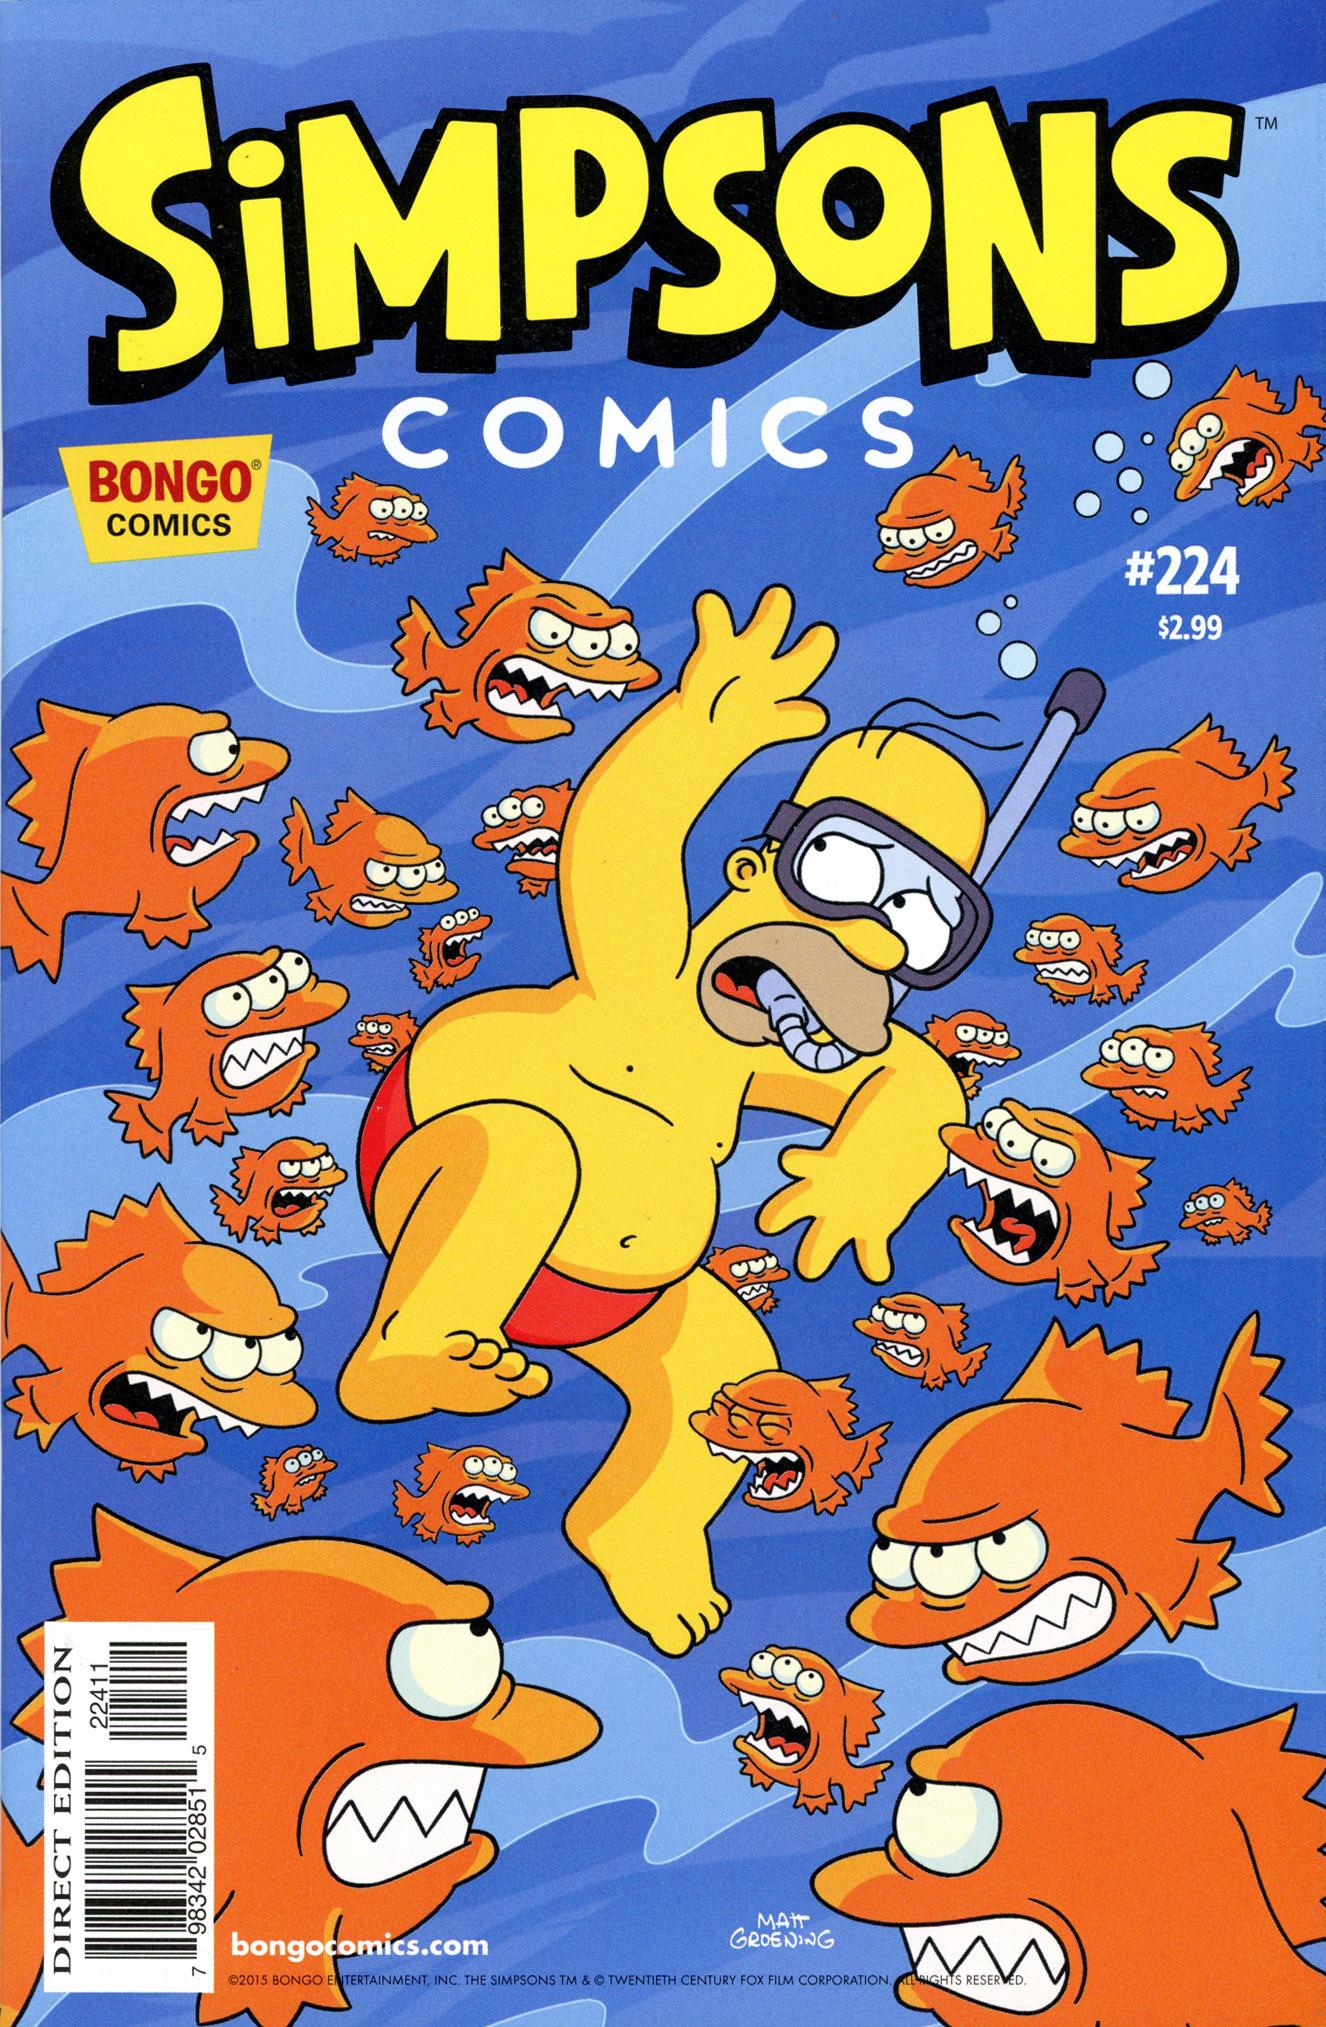 Simpsons Comics 224 Page 1